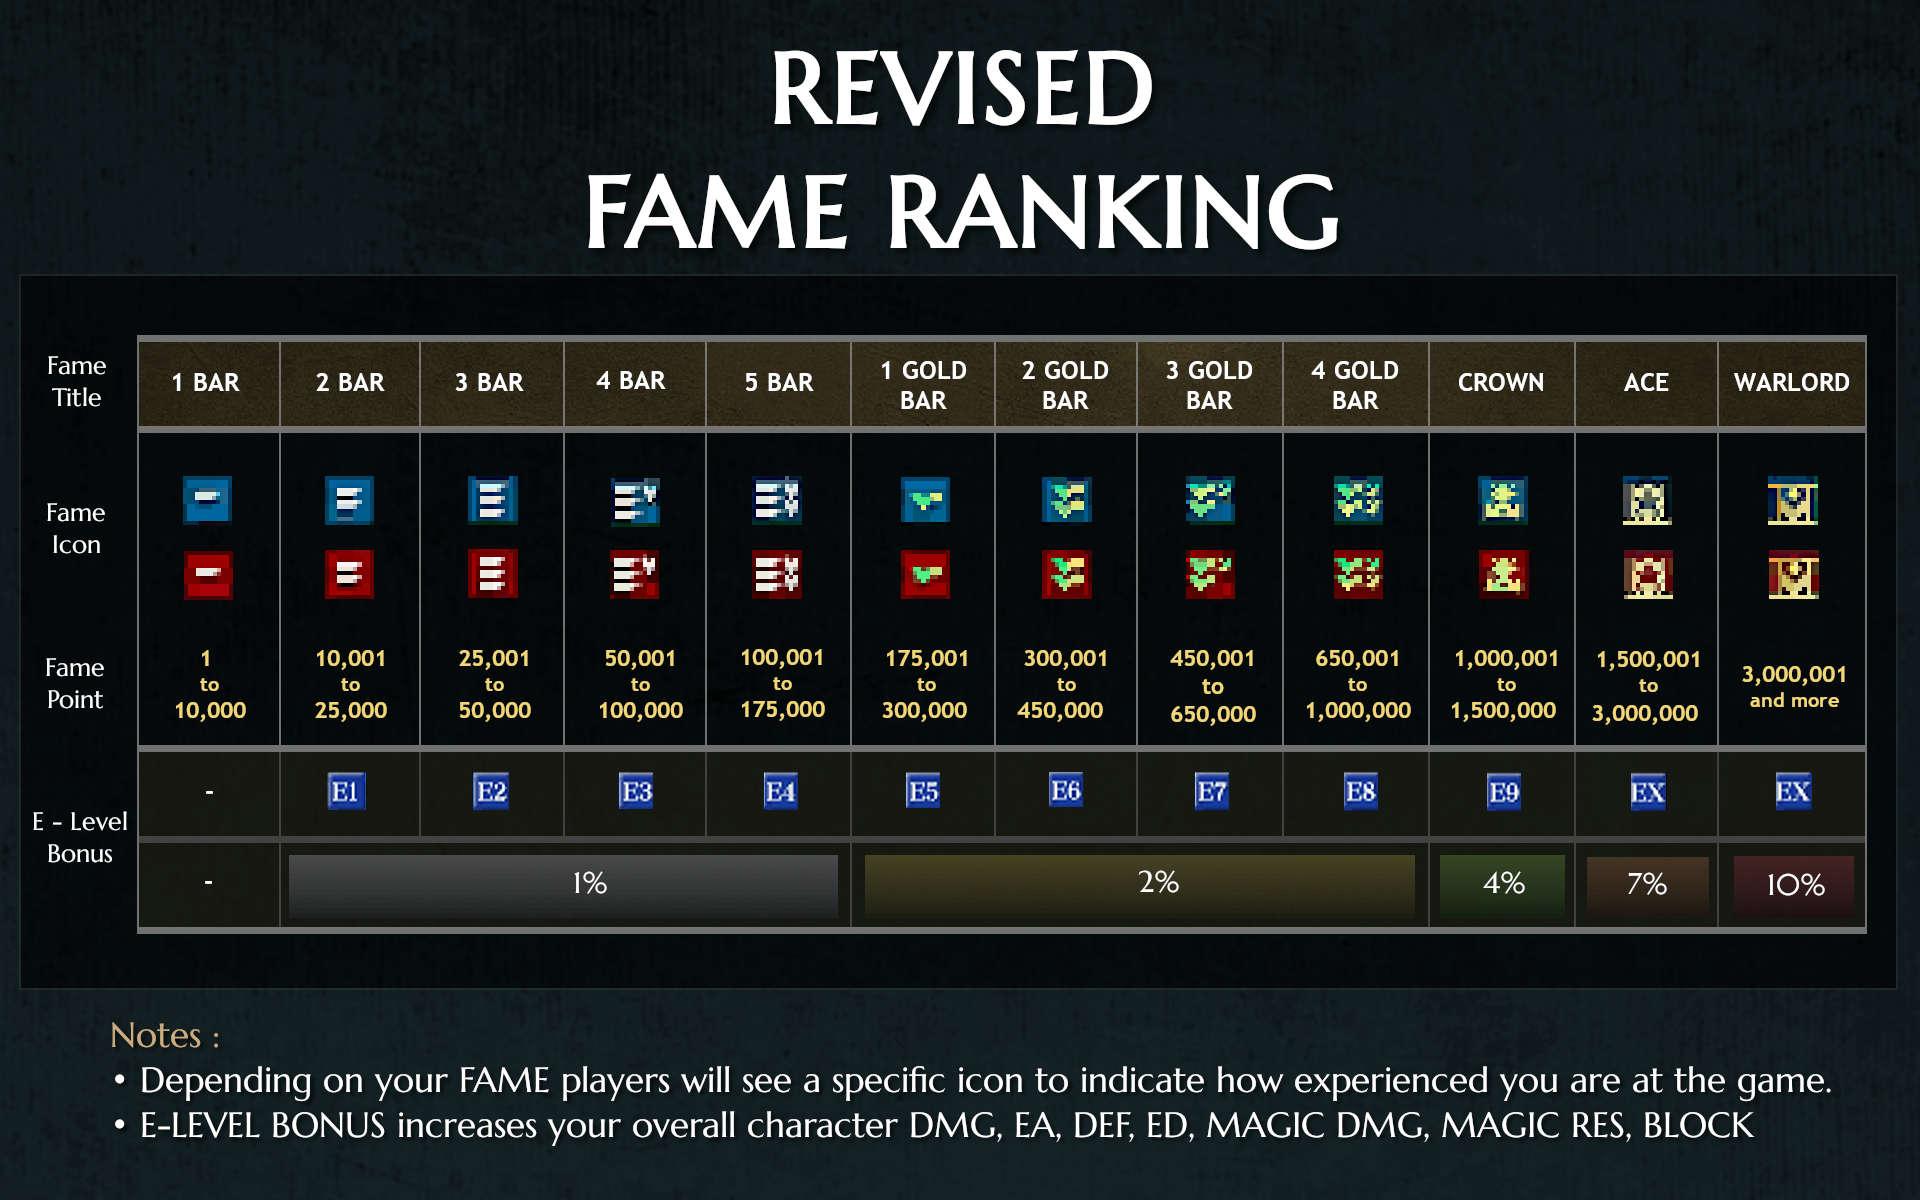 Revised Fame Ranking